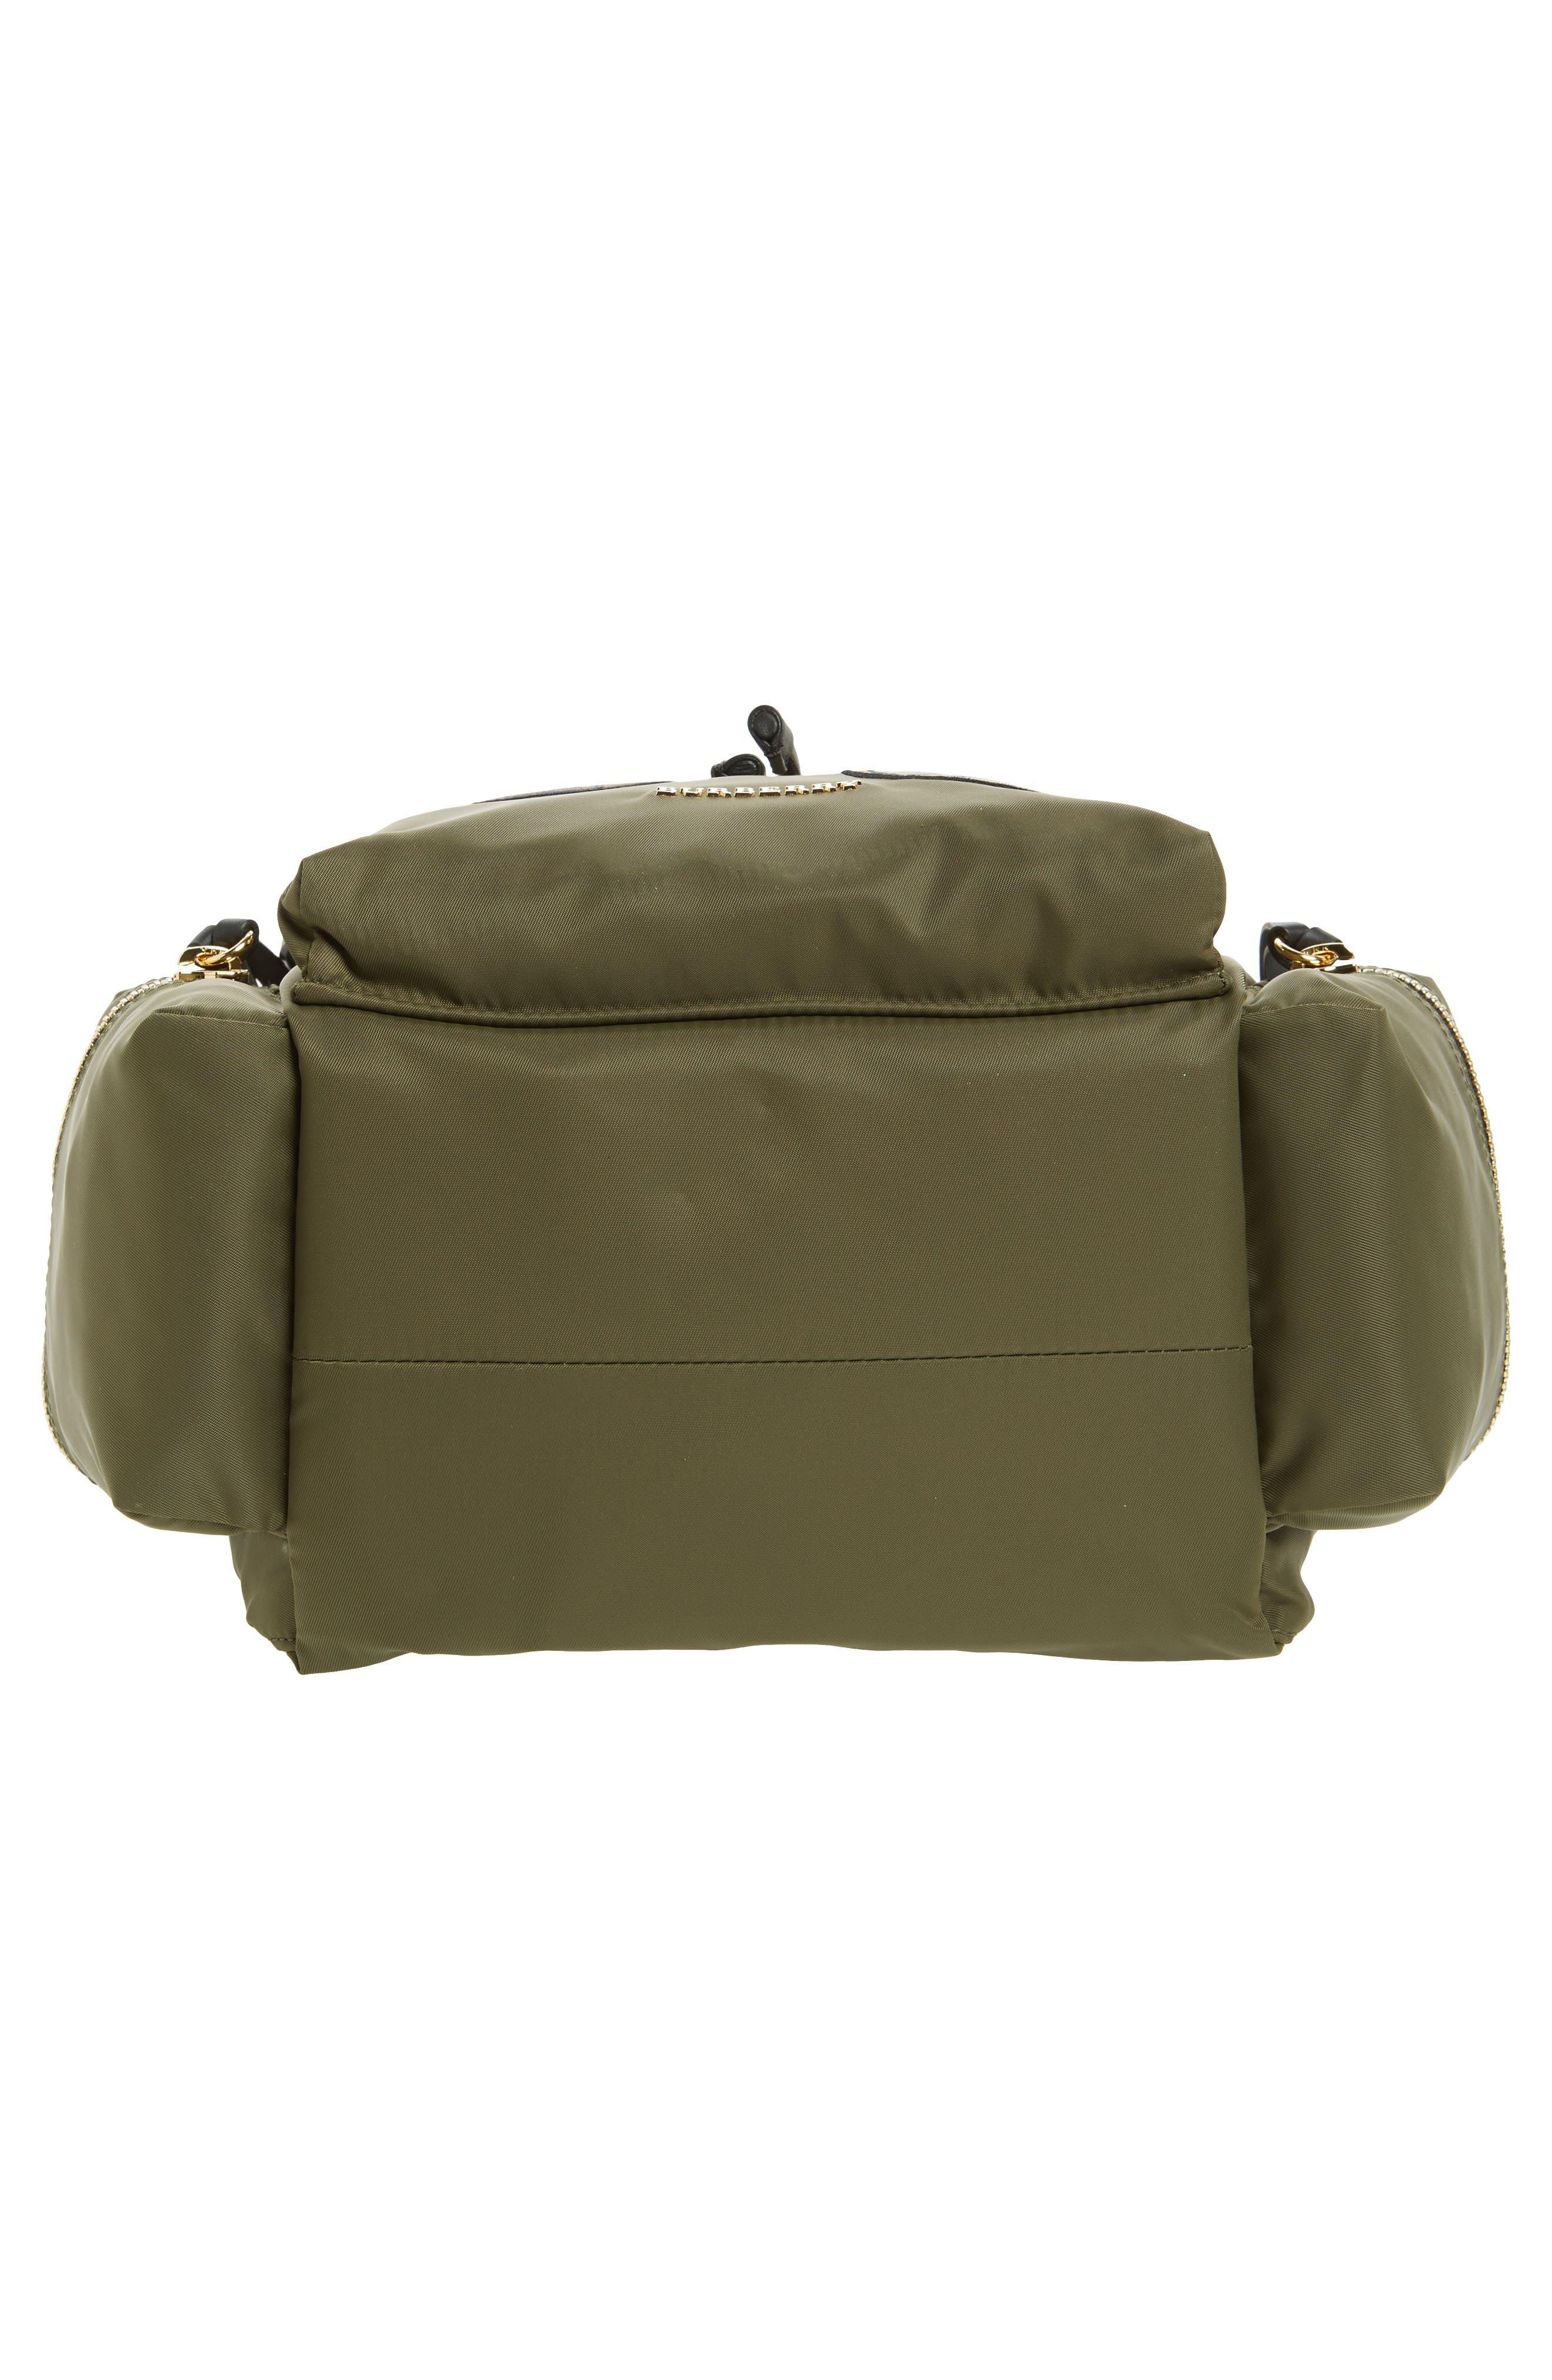 Medium Patches Rucksack Nylon Backpack,                             Alternate thumbnail 6, color,                             311